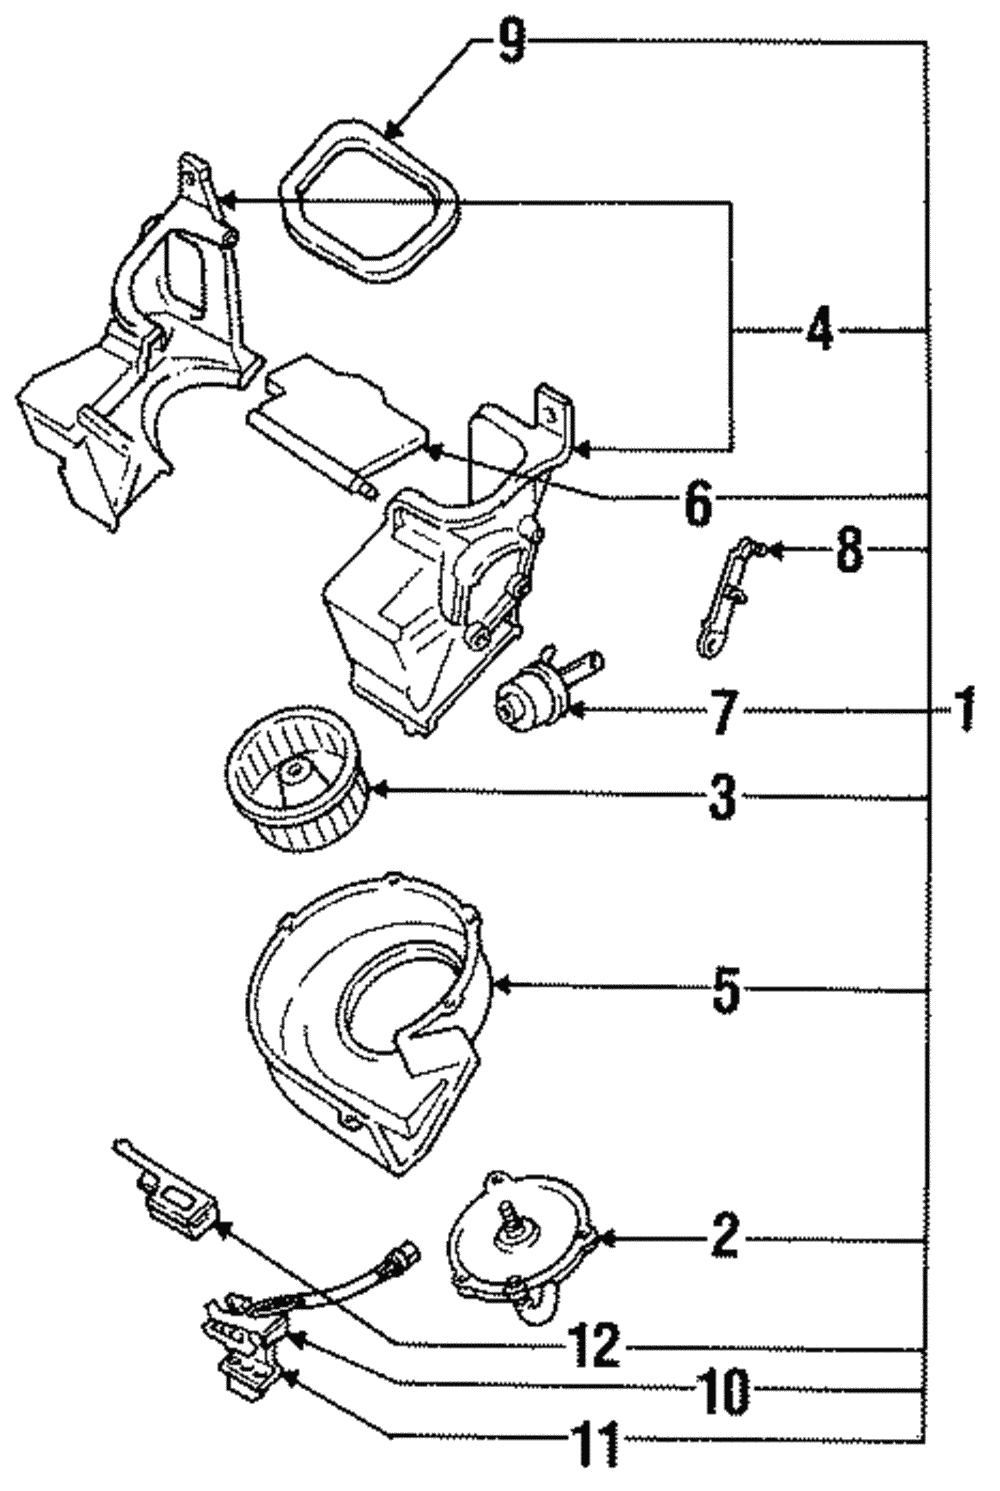 genuine subaru blower motor 72073ga170 ebay 1988 Subaru GL genuine subaru blower motor 72073ga170